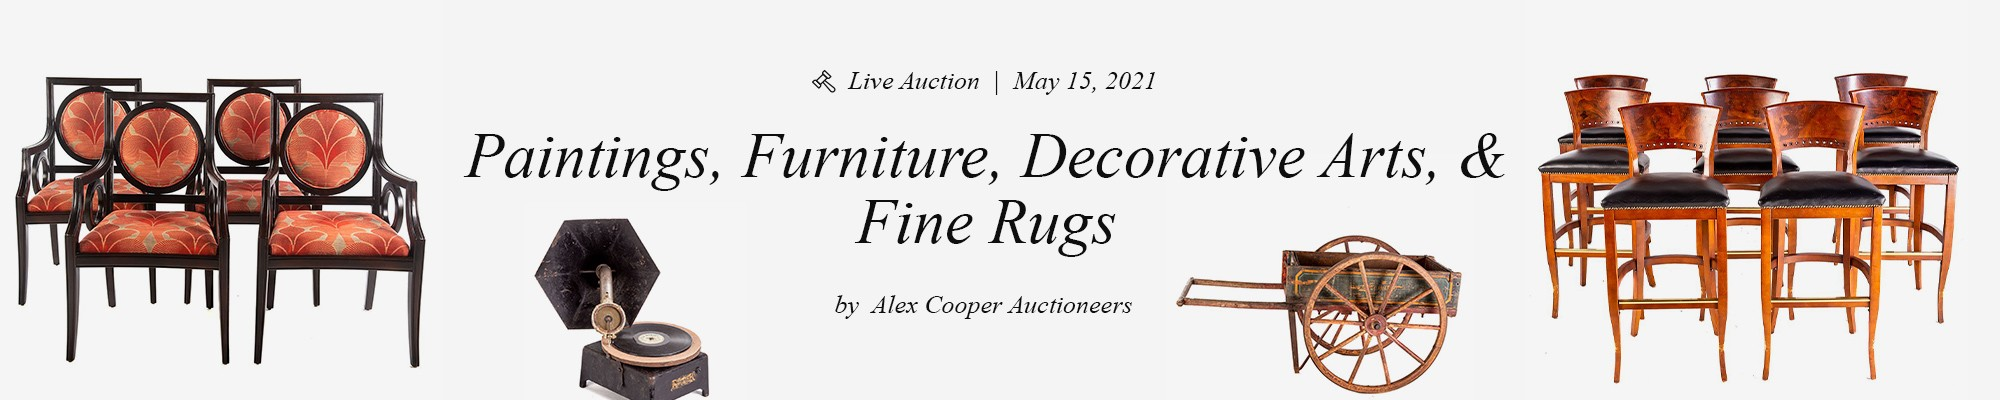 paintings-furniture-decorative-arts-fine-rug-alex-cooper